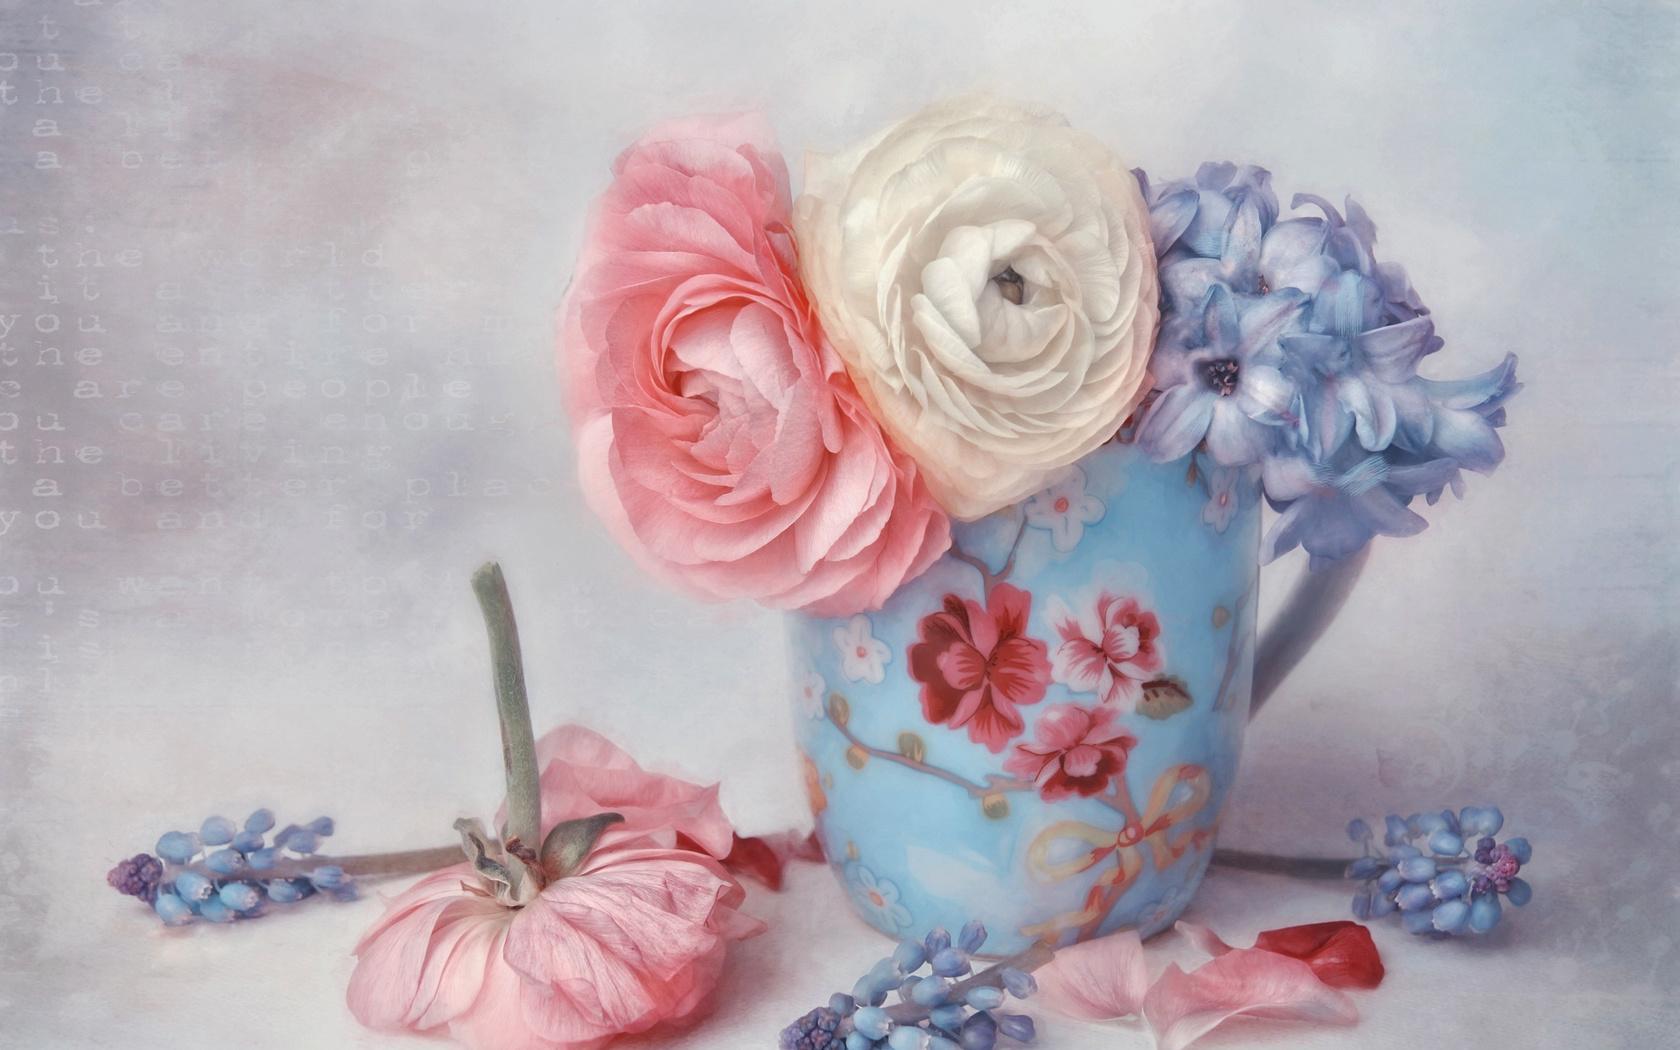 lizzy pe, кружка, цветы, лютики, гиацинты, арт, лепестки, digital art